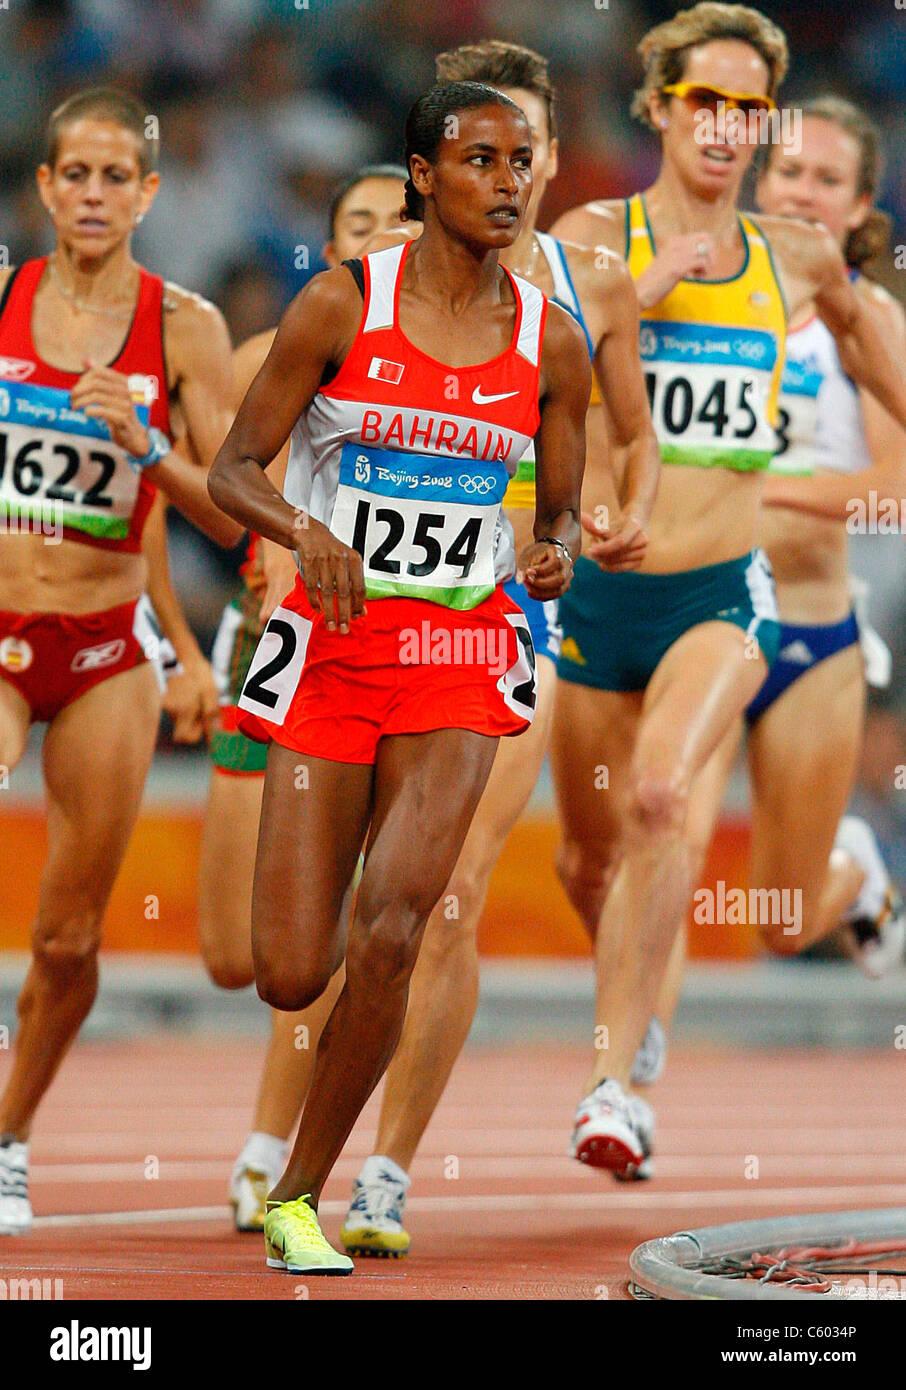 MARYAM YUSUF JAMAL BAHRAIN OLYMPIC STADIUM BEIJING CHINA 21 August 2008 - Stock Image